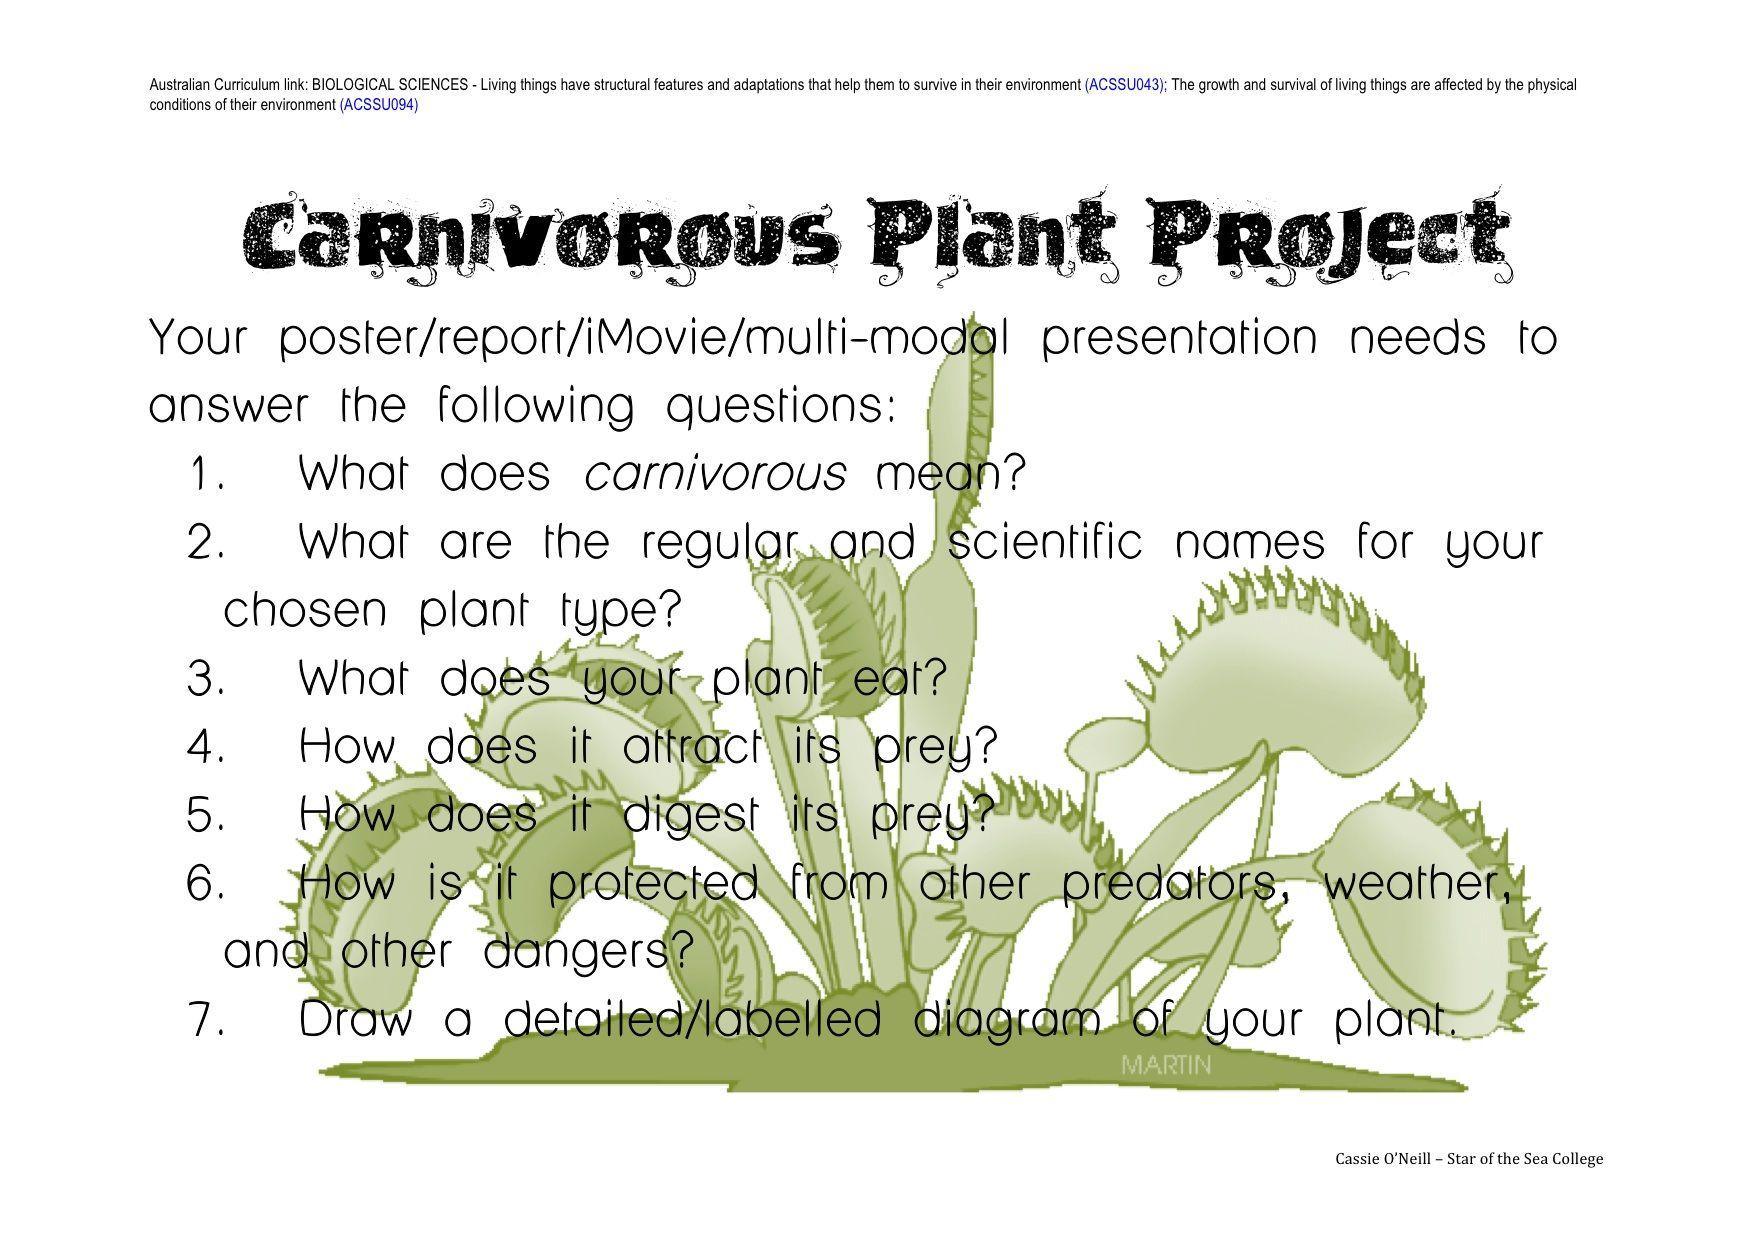 Carnivorous Plants Project Questions